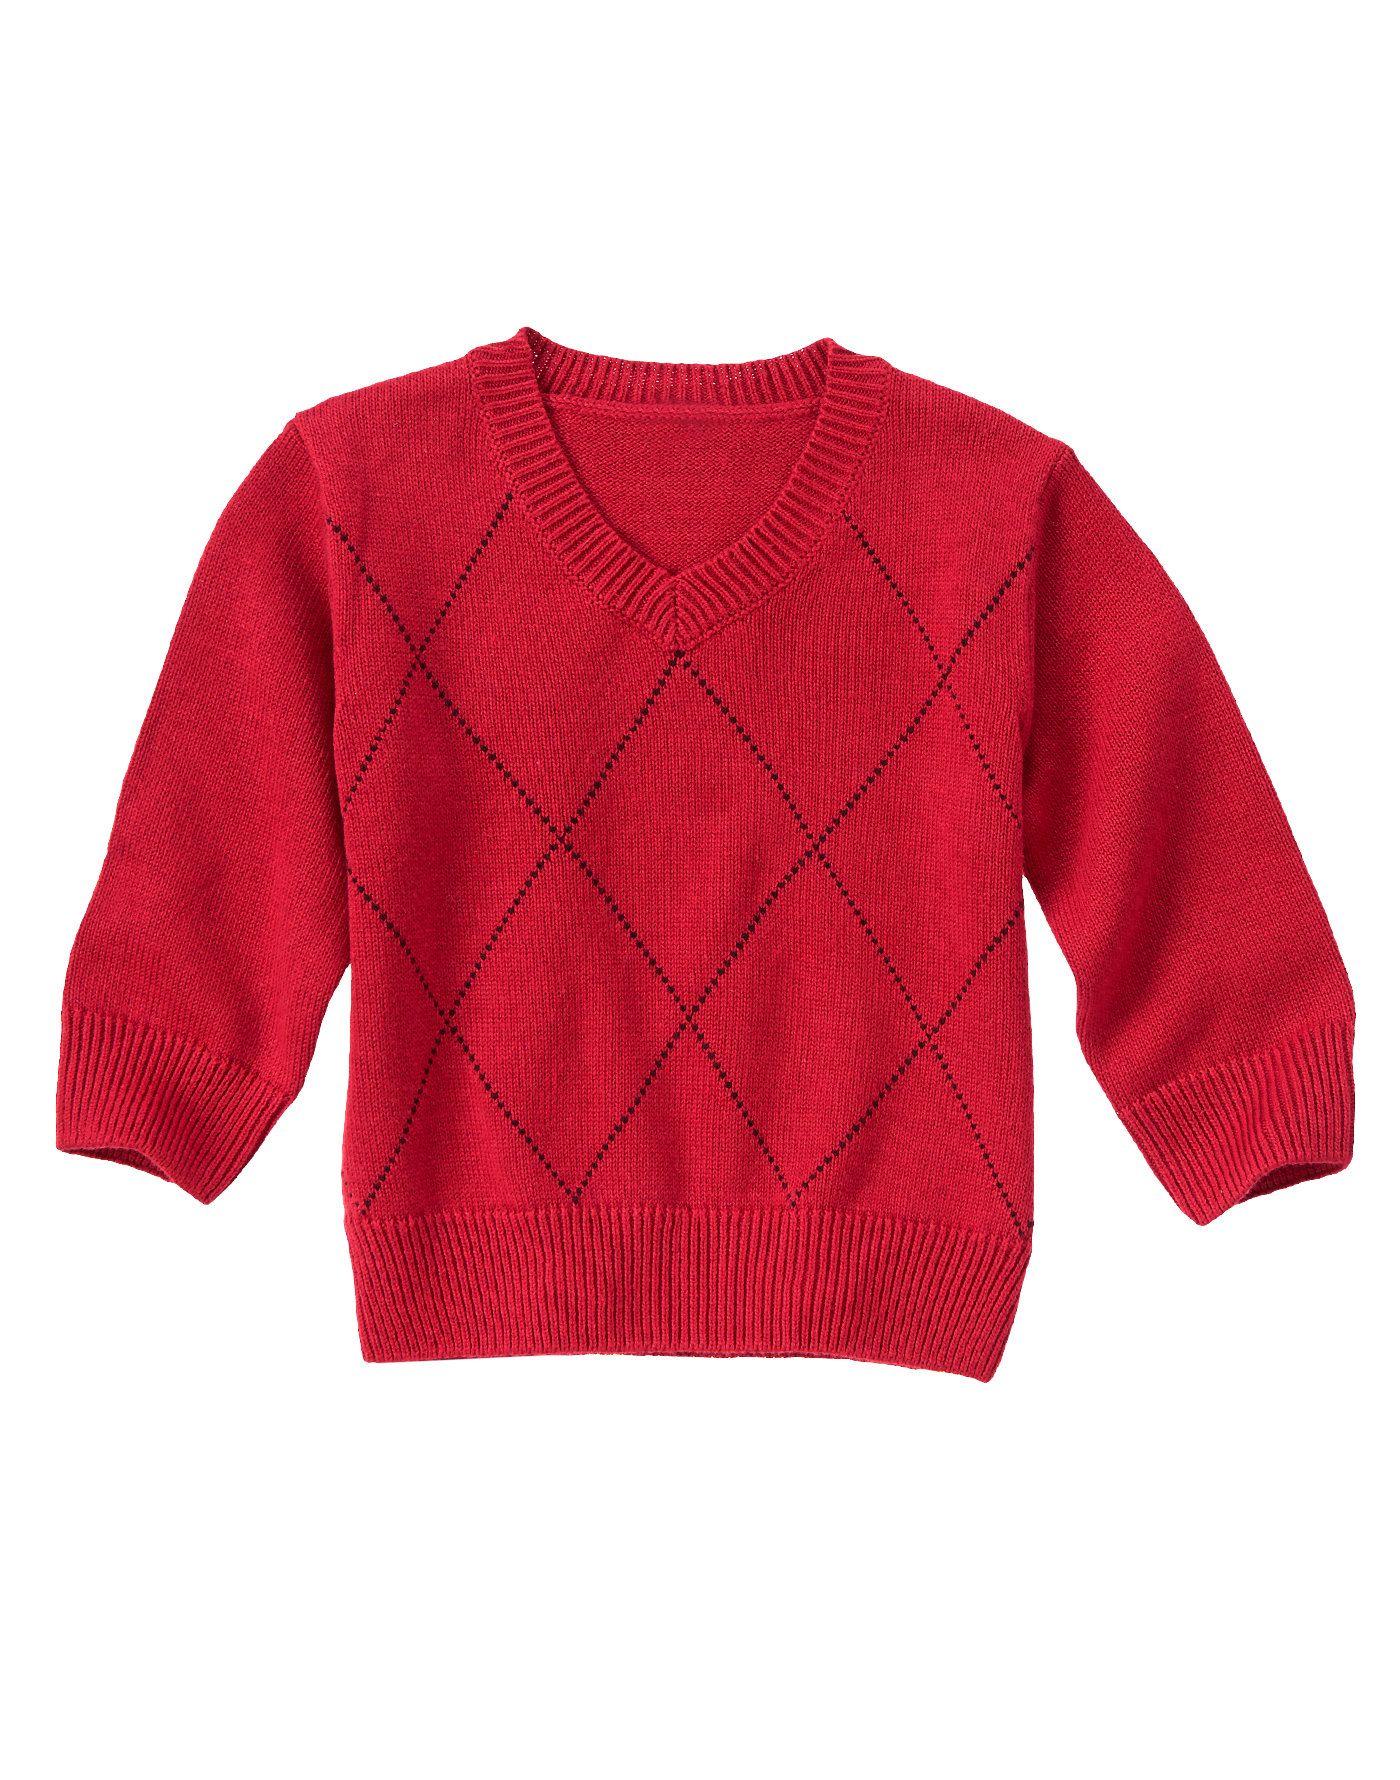 Windowpane Sweater at Gymboree